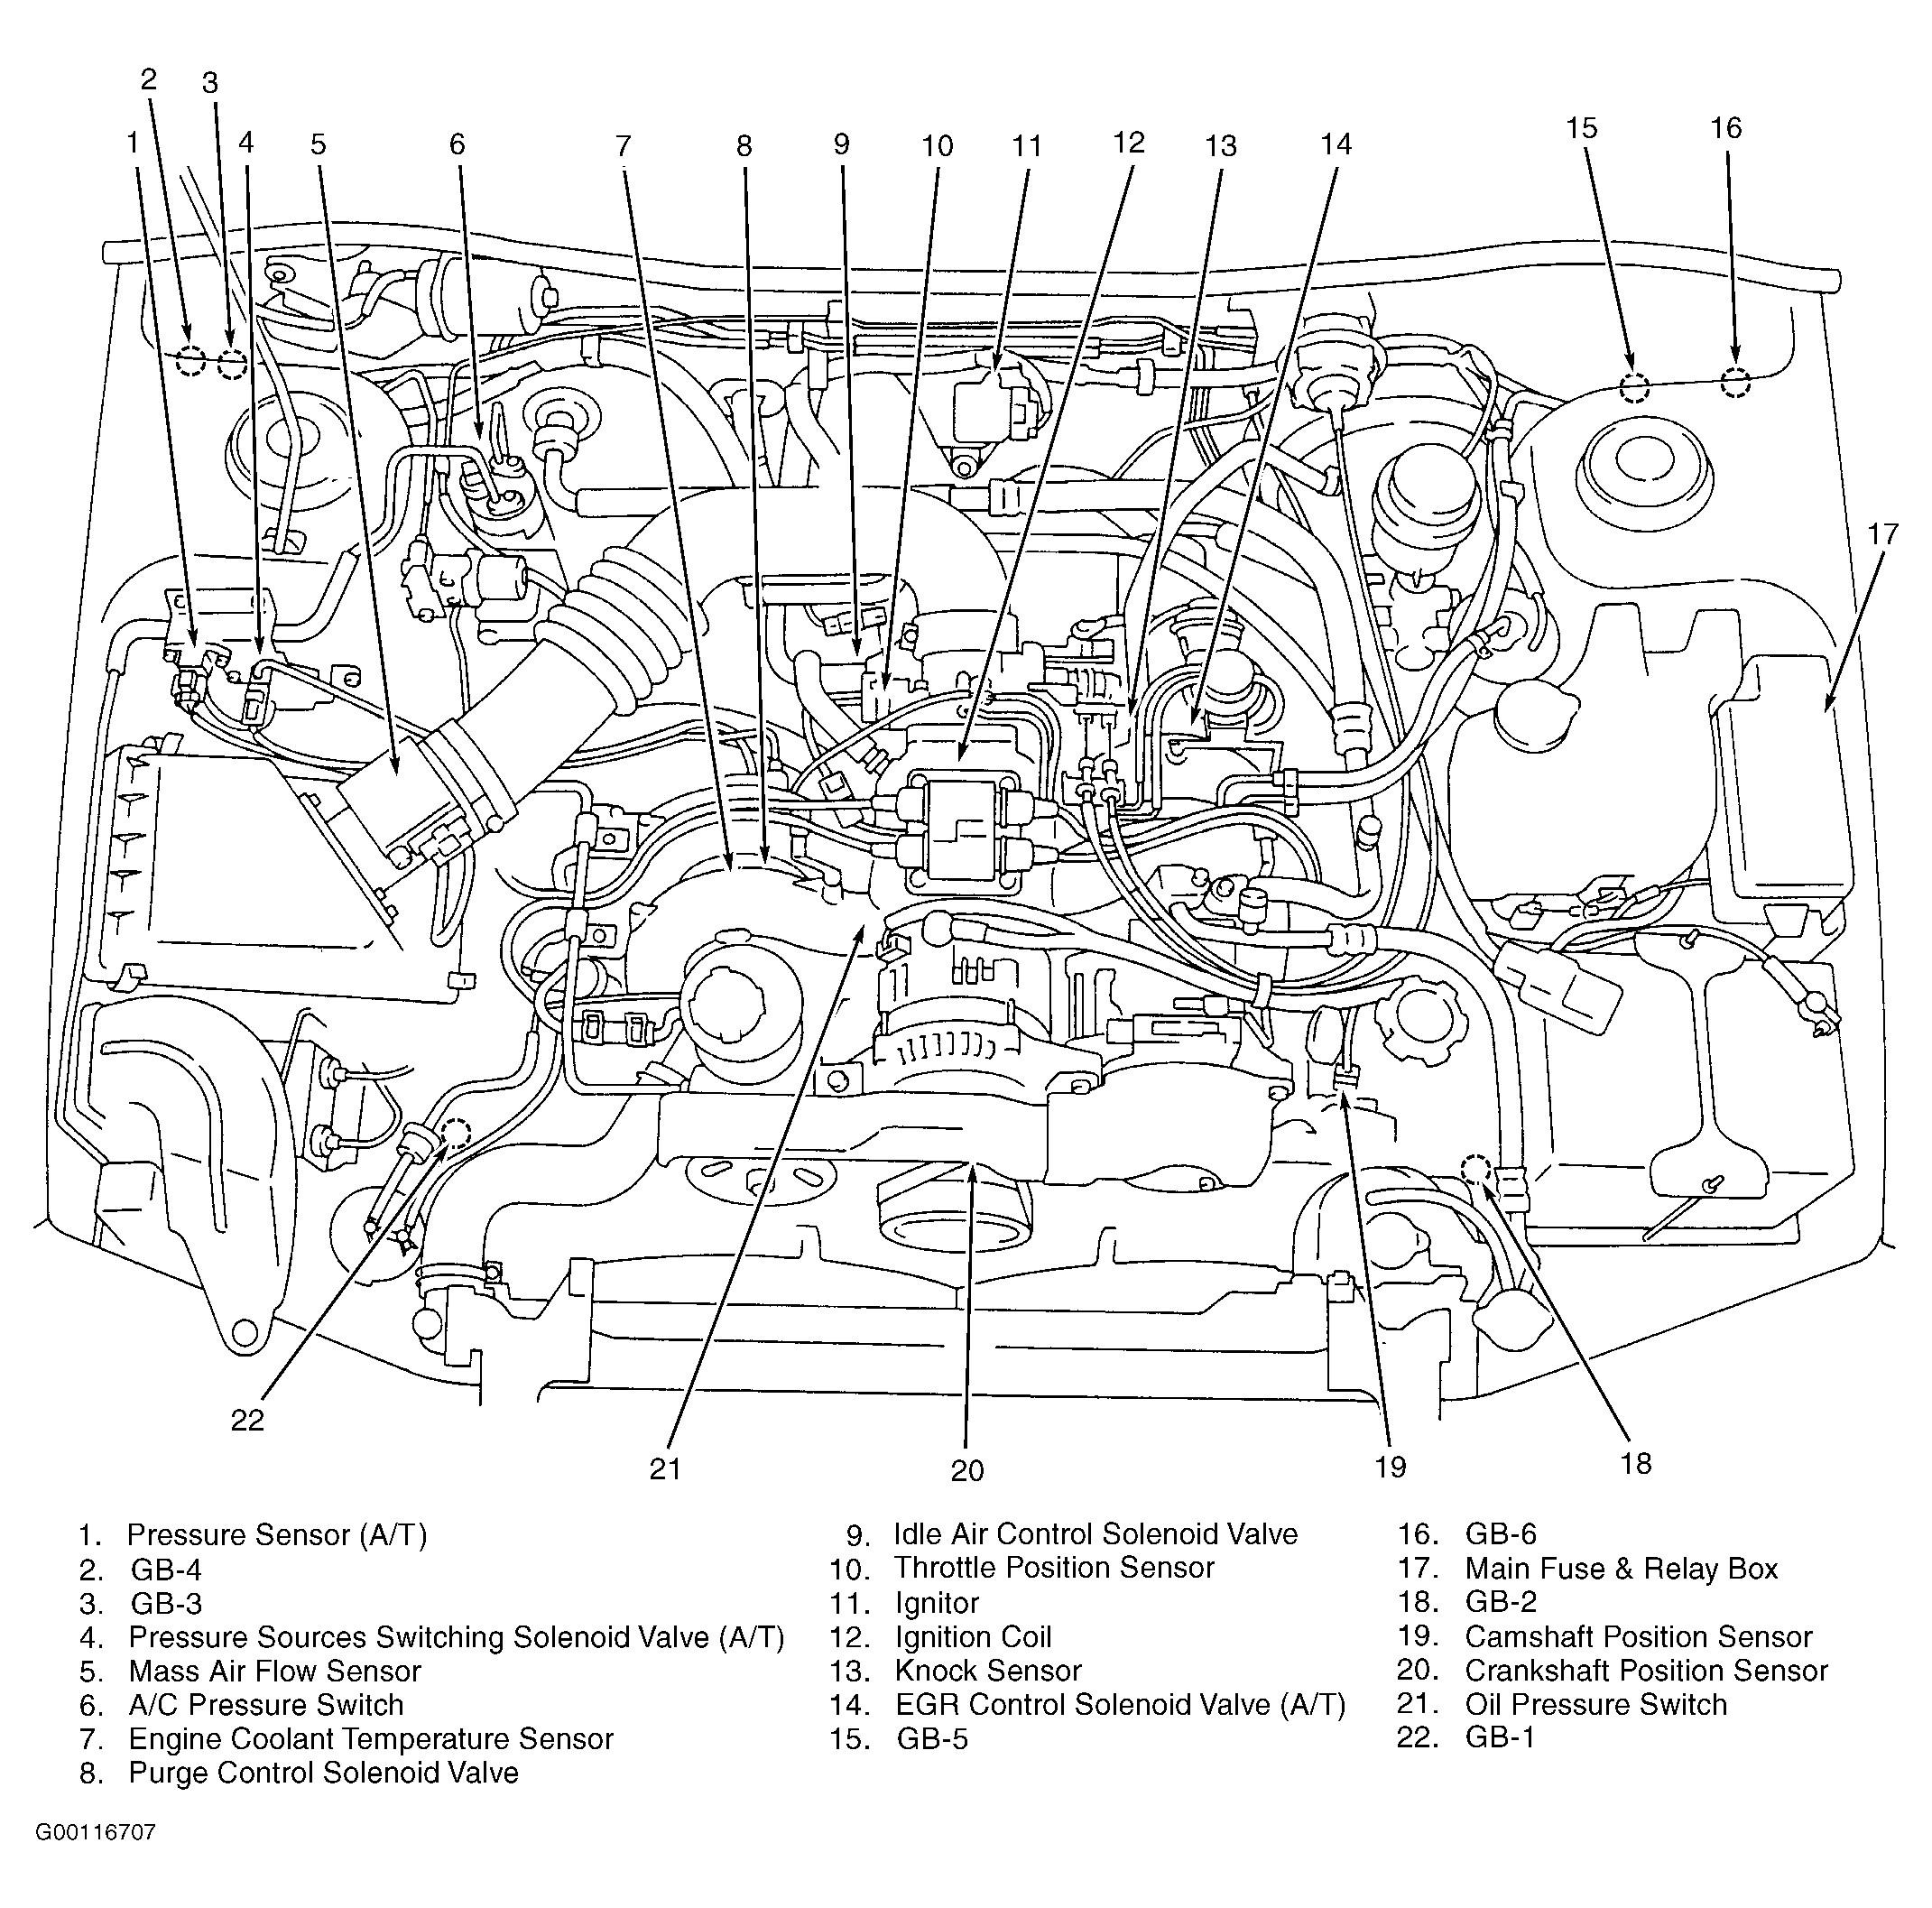 [DIAGRAM_38EU]  HY_2442] Dw402 Wiring Diagram Dimarzio Free Diagram | 1993 Subaru Impreza Engine Diagram |  | Amenti Venet Cajos Mohammedshrine Librar Wiring 101